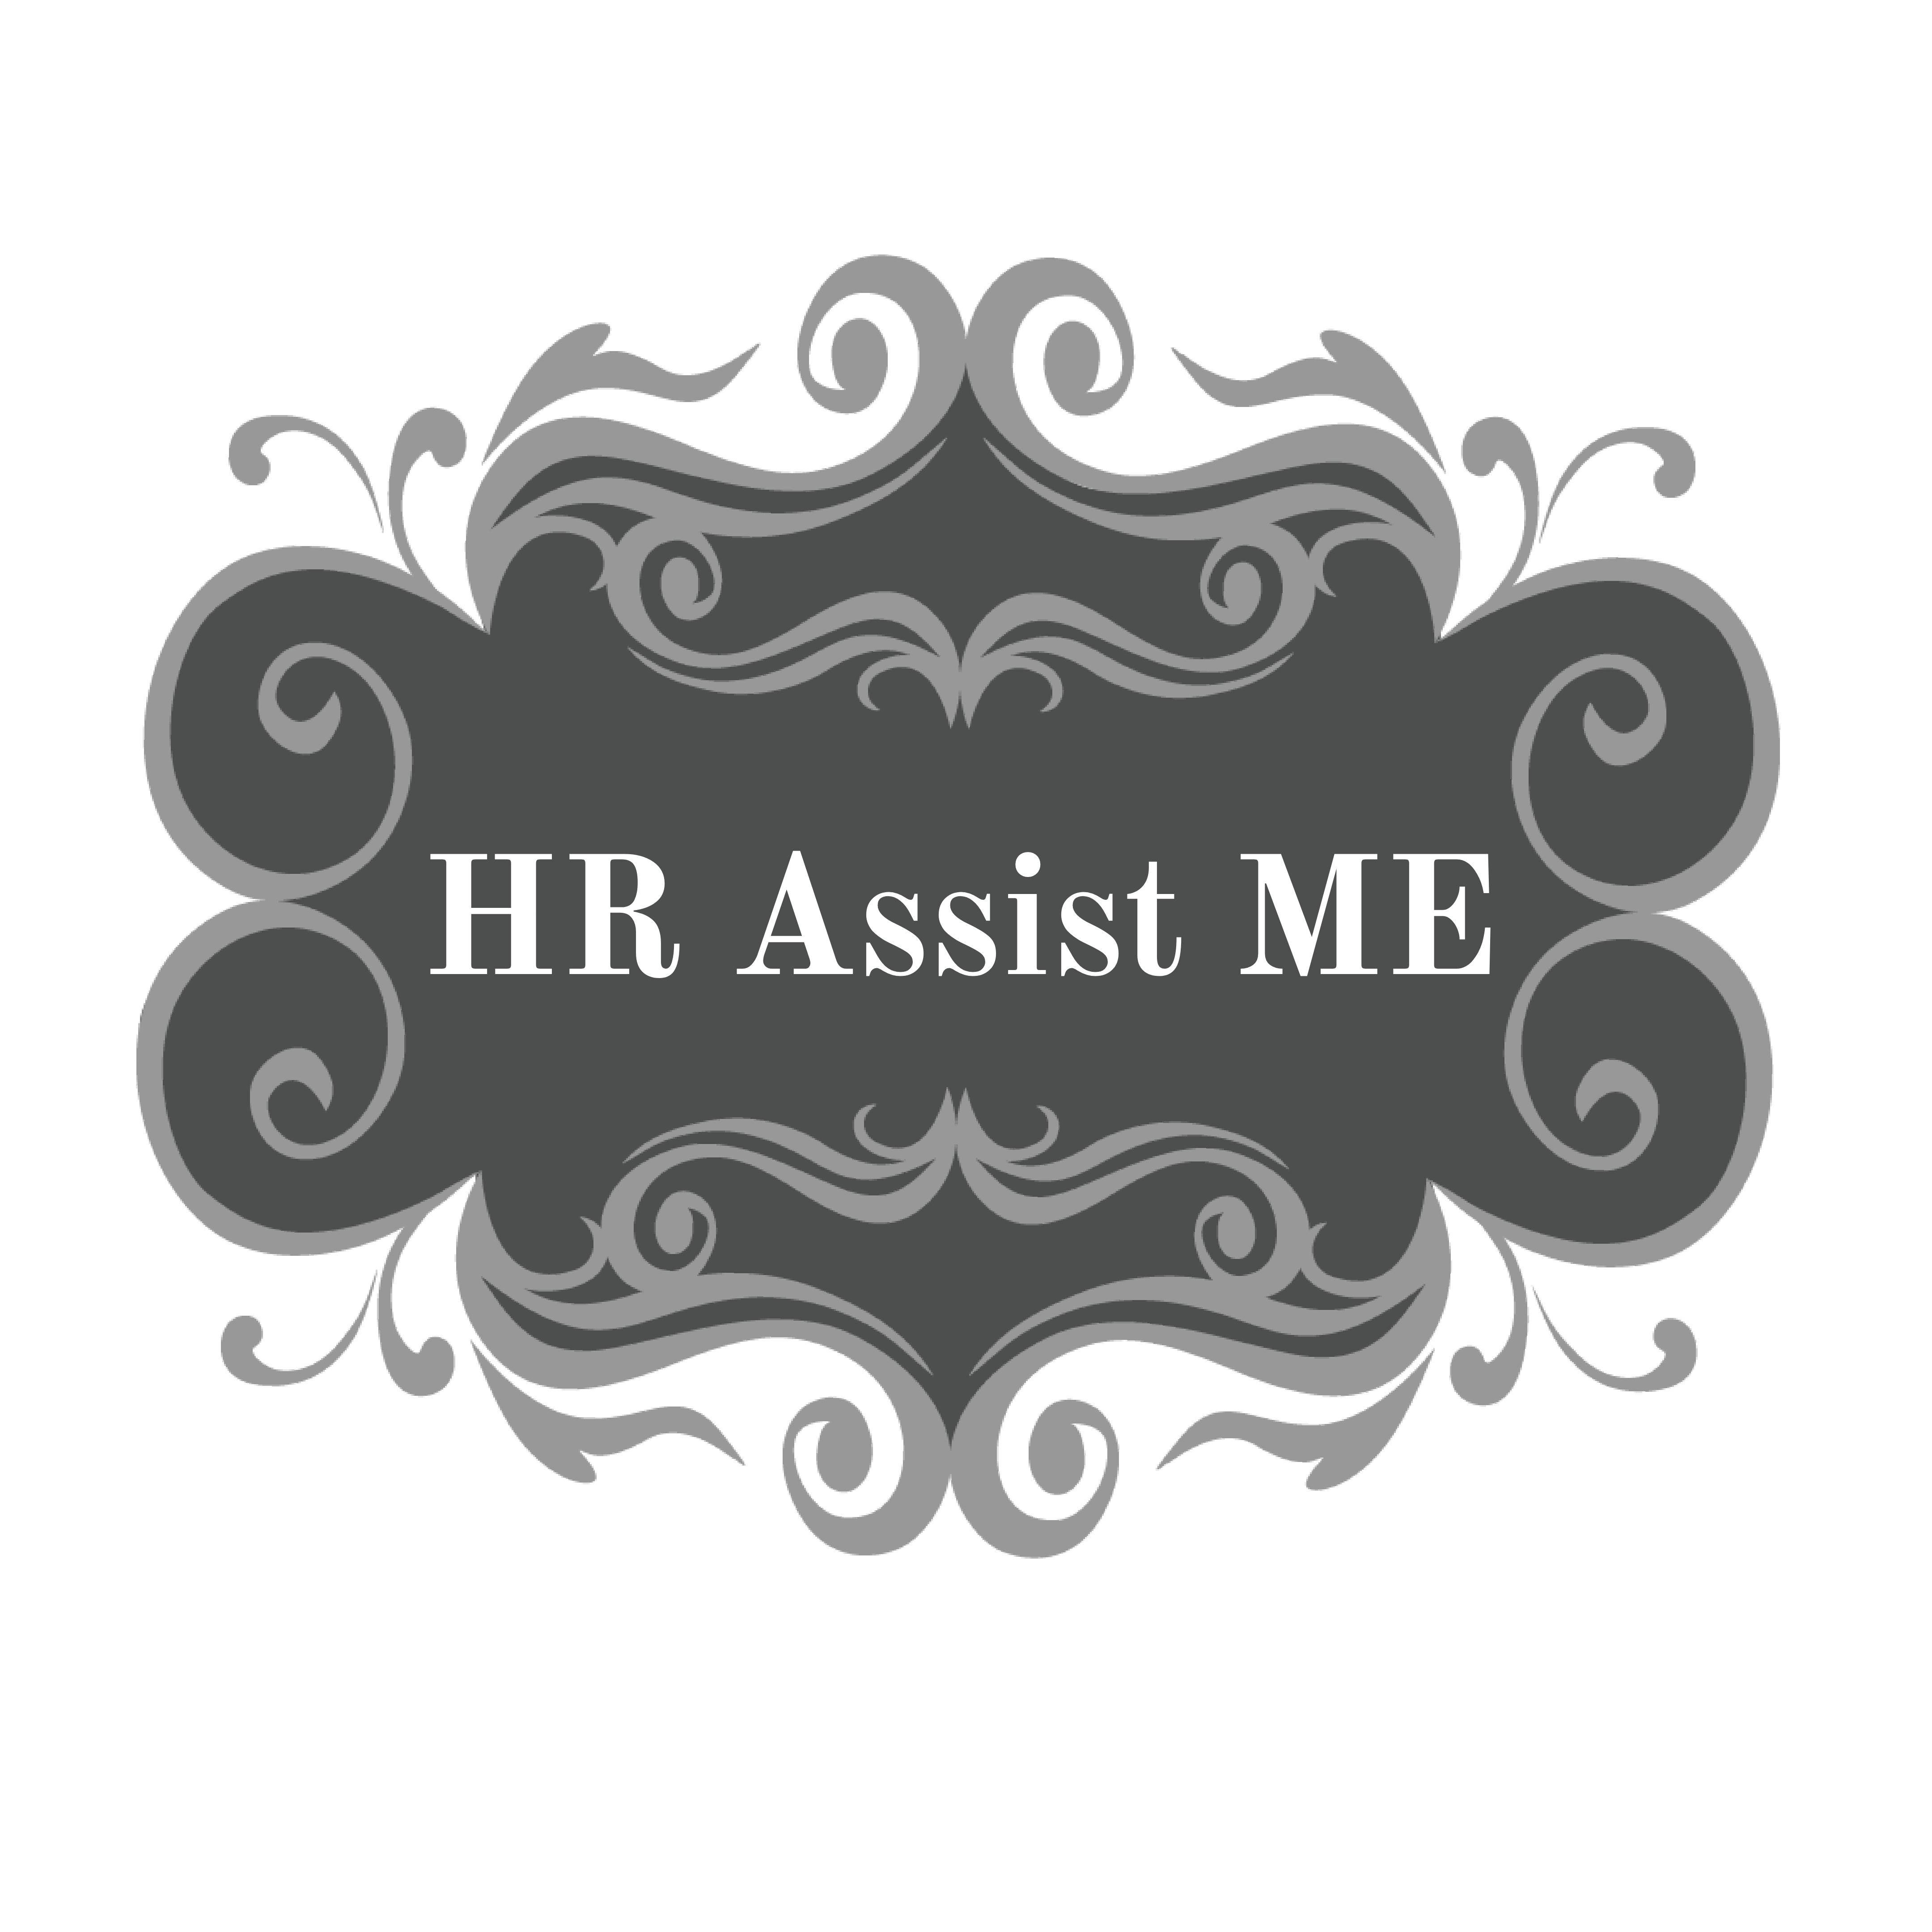 HR Assist ME LLC